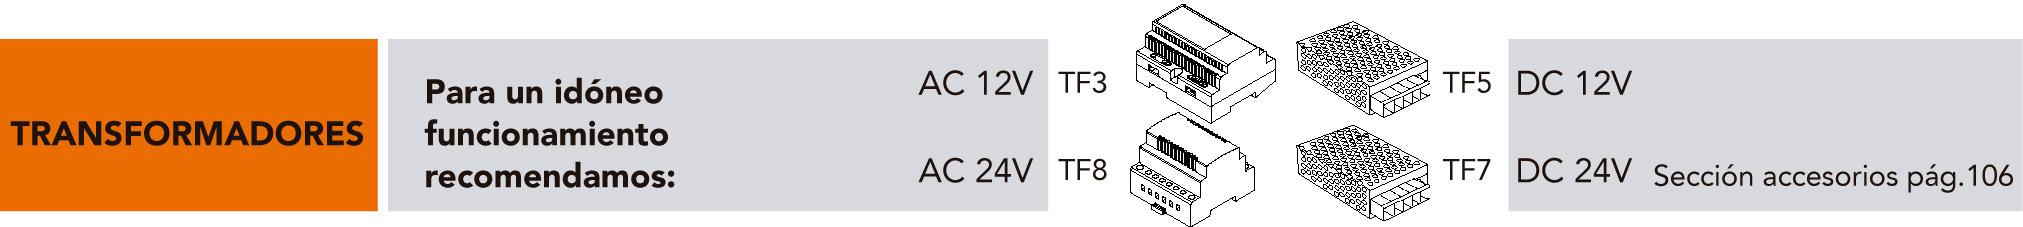 S62_transformadores